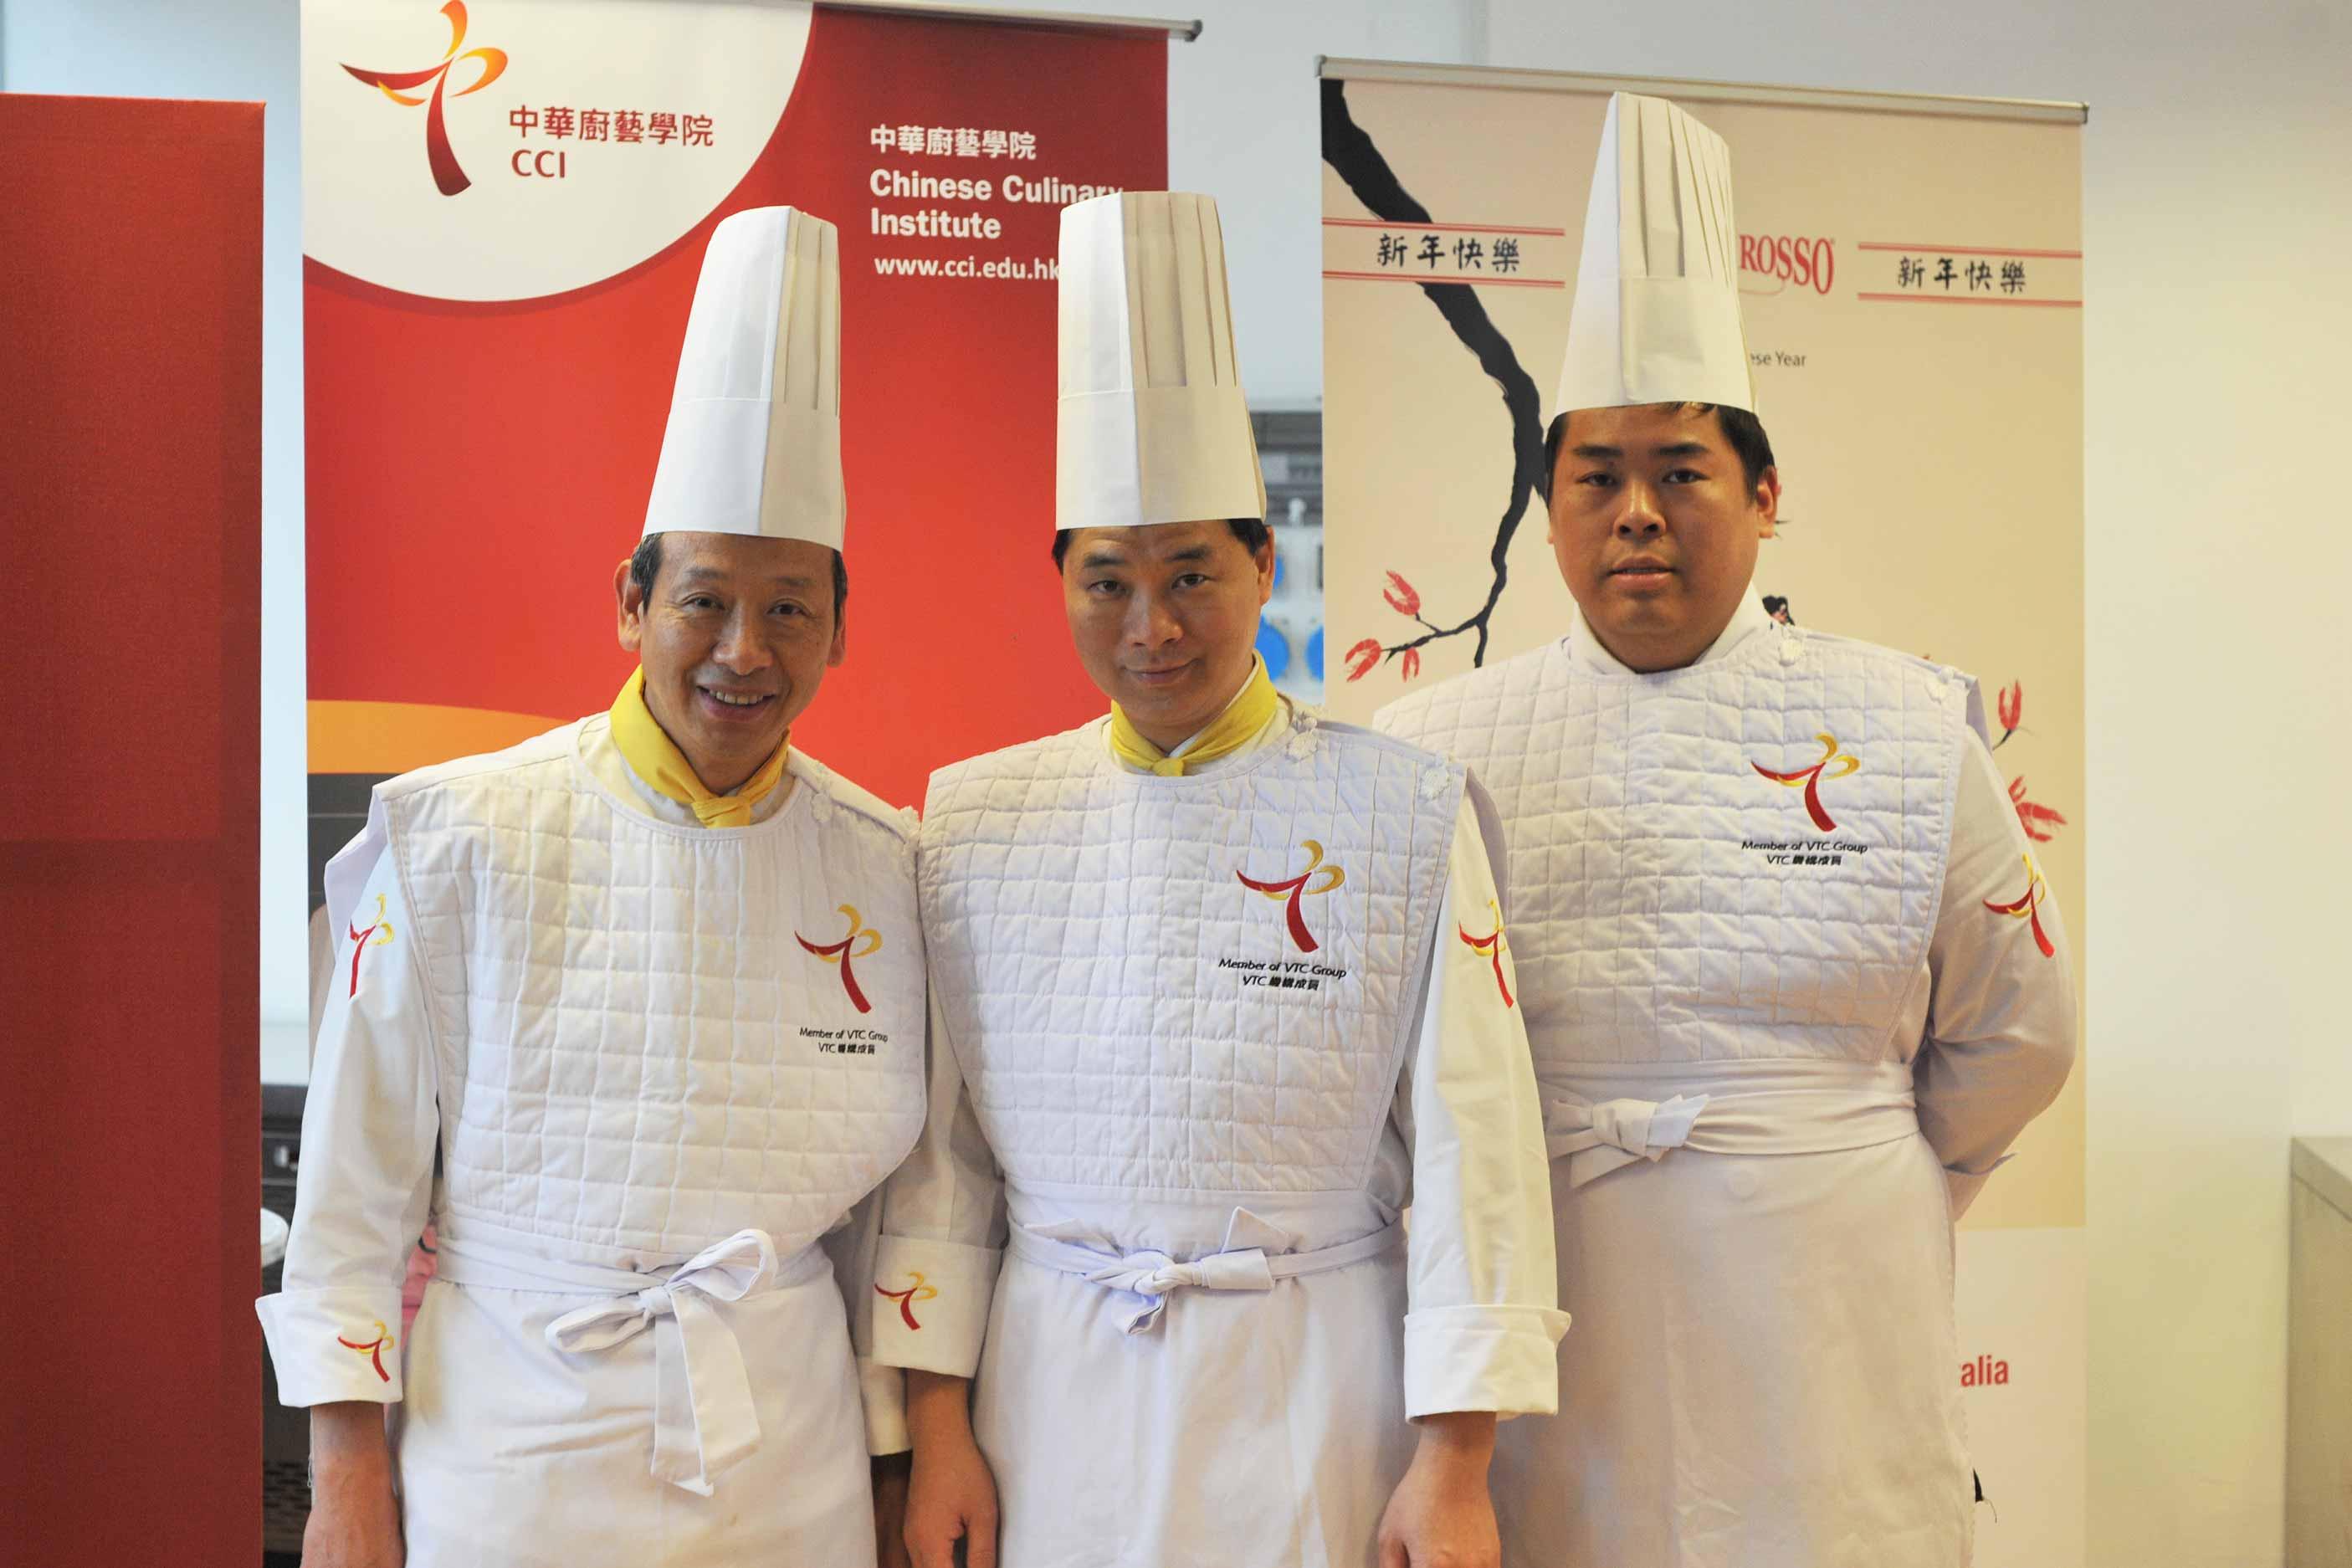 chef-cinesi